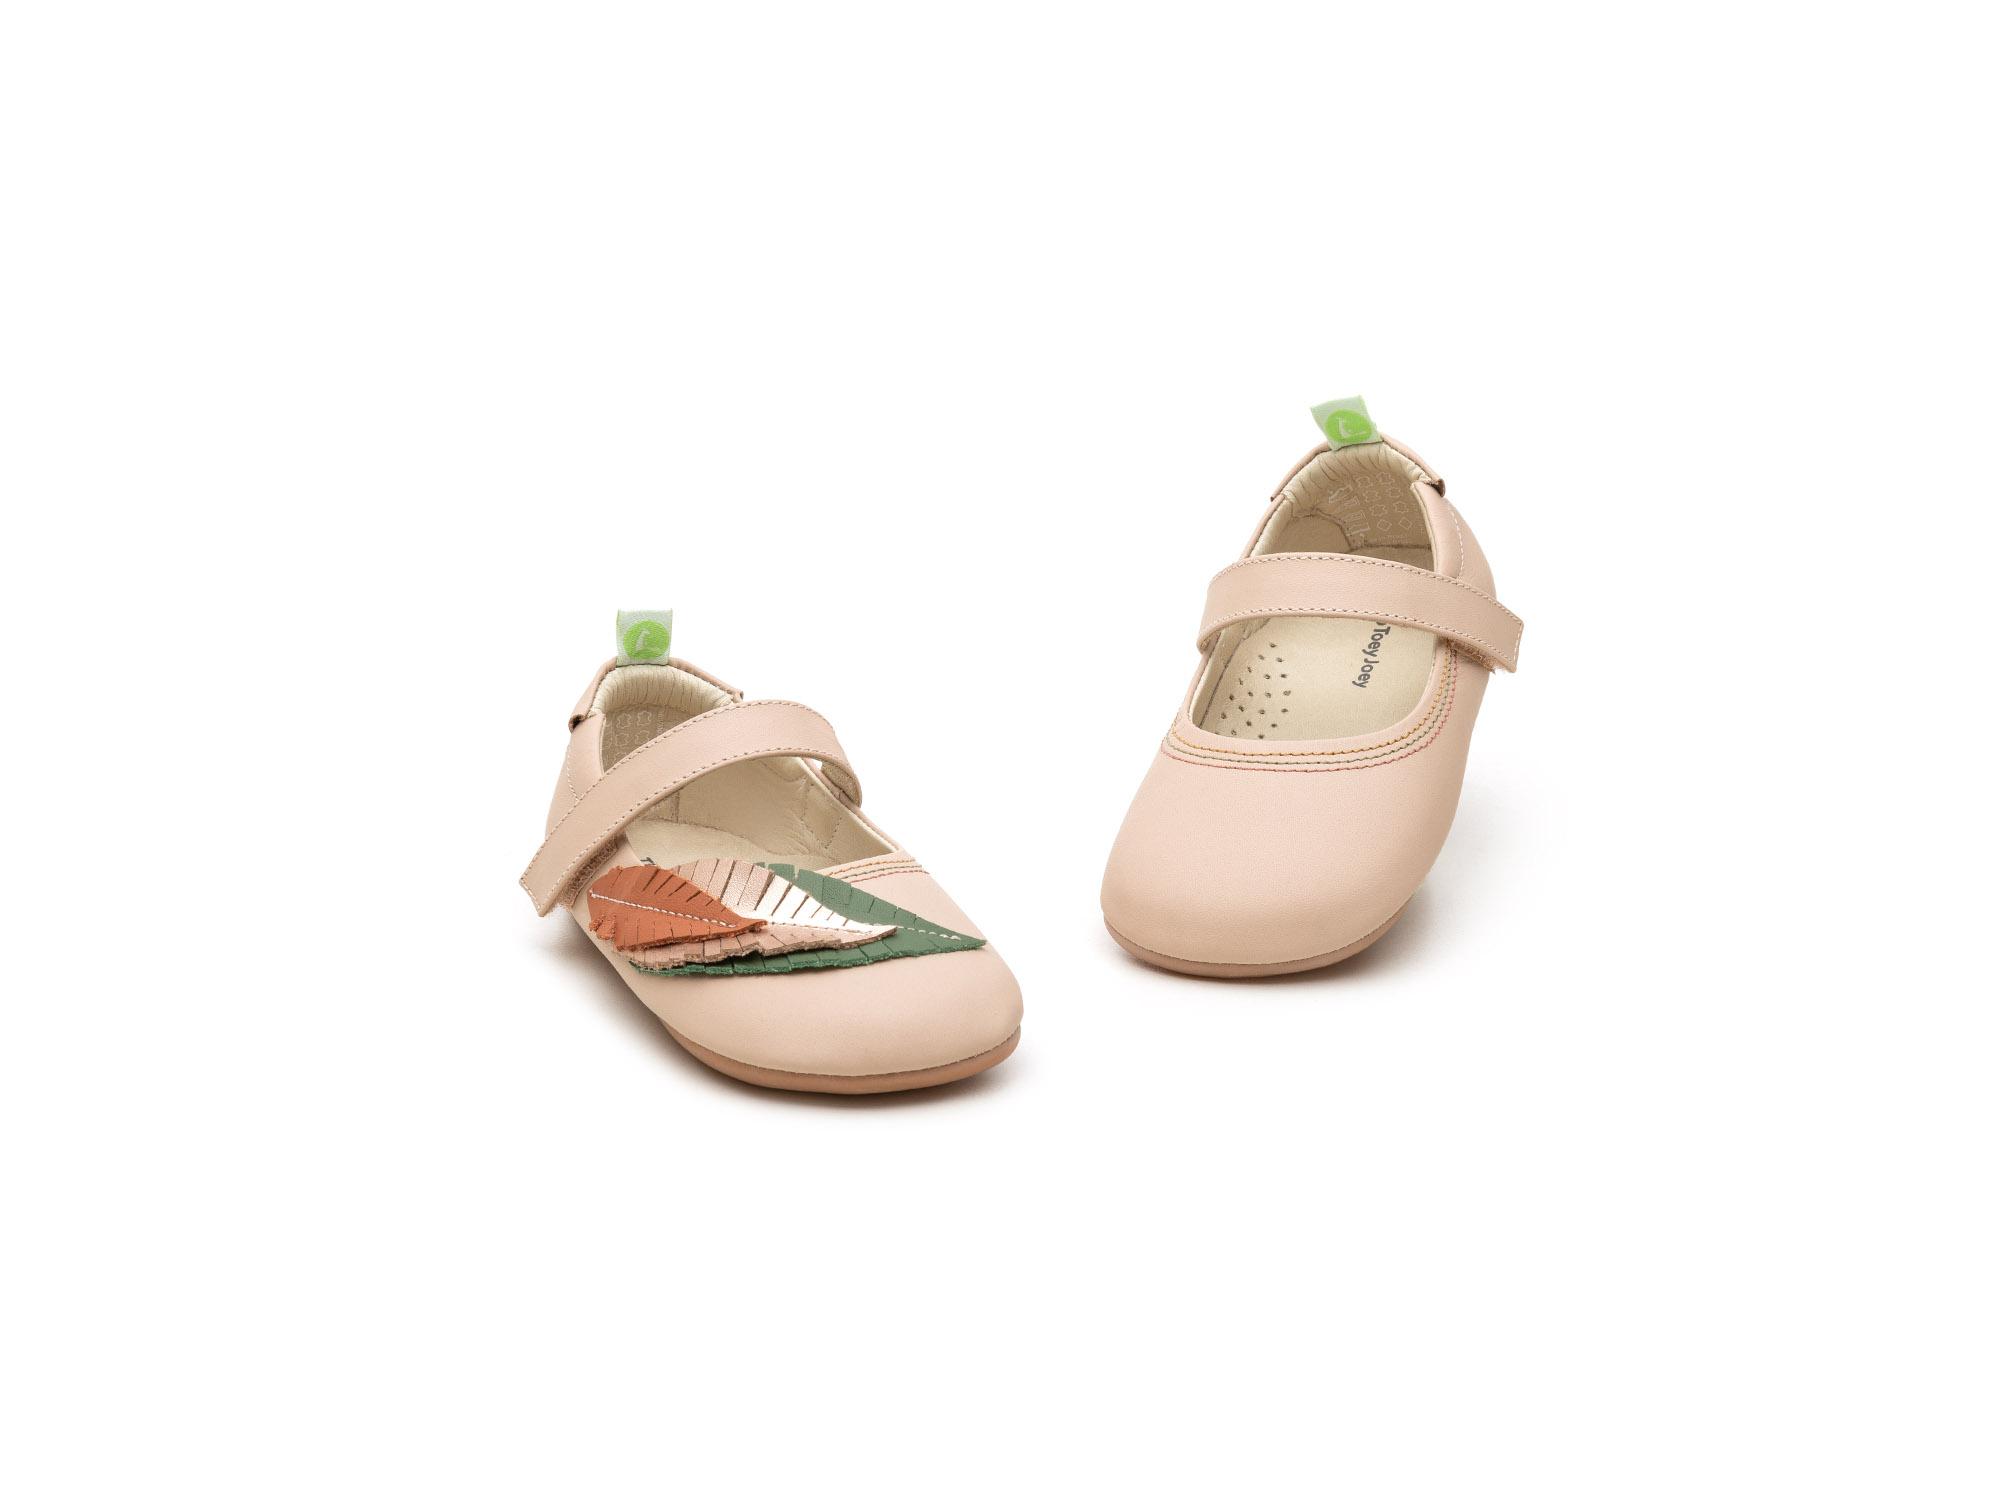 sapatilha Bebê feminino leafy